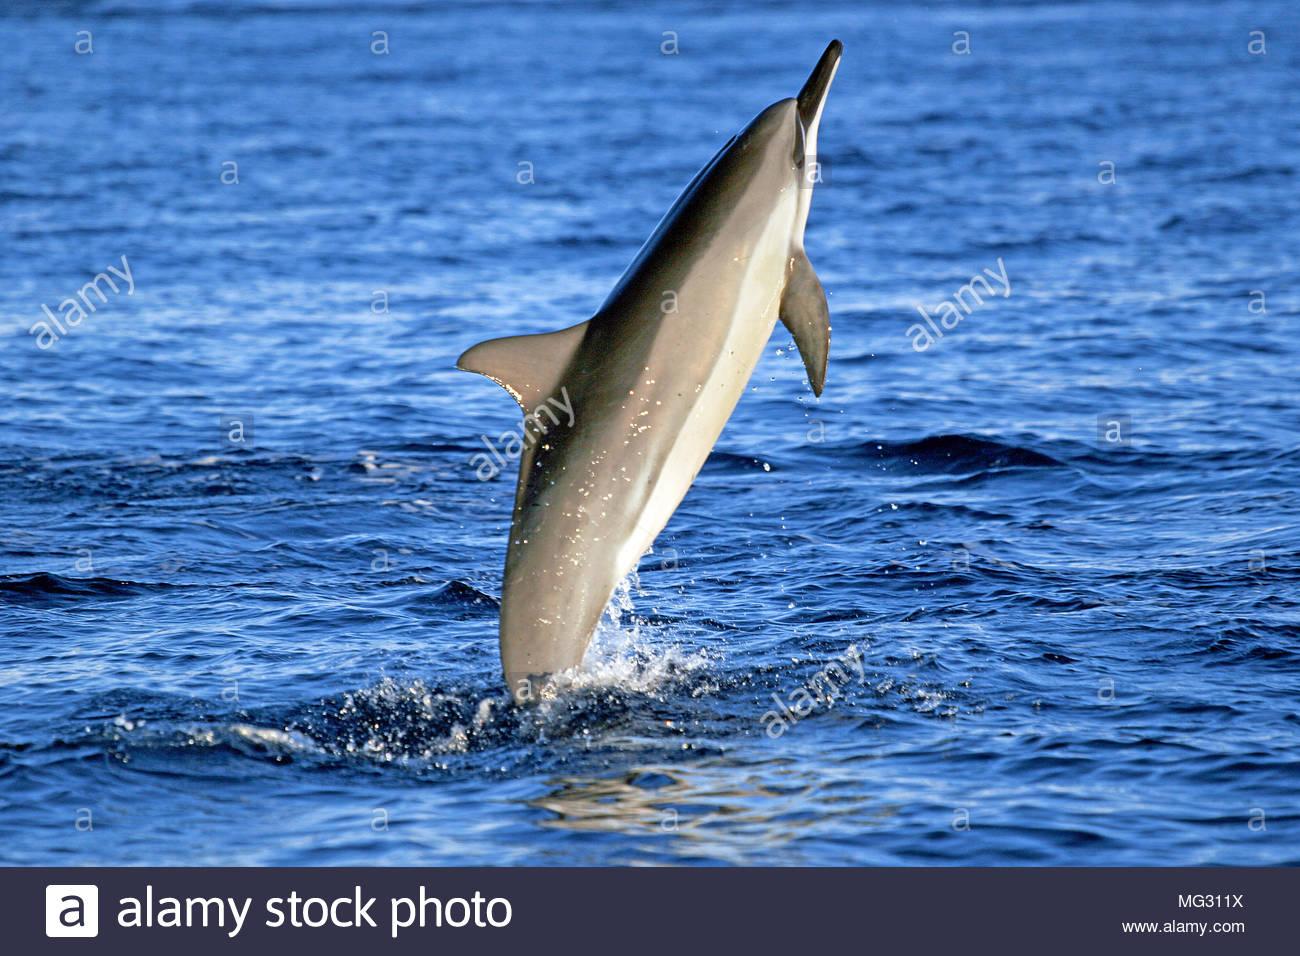 Spinner dolphin (Stenella longirostris), leaping, Ogasawara Islands, Japan - Stock Image